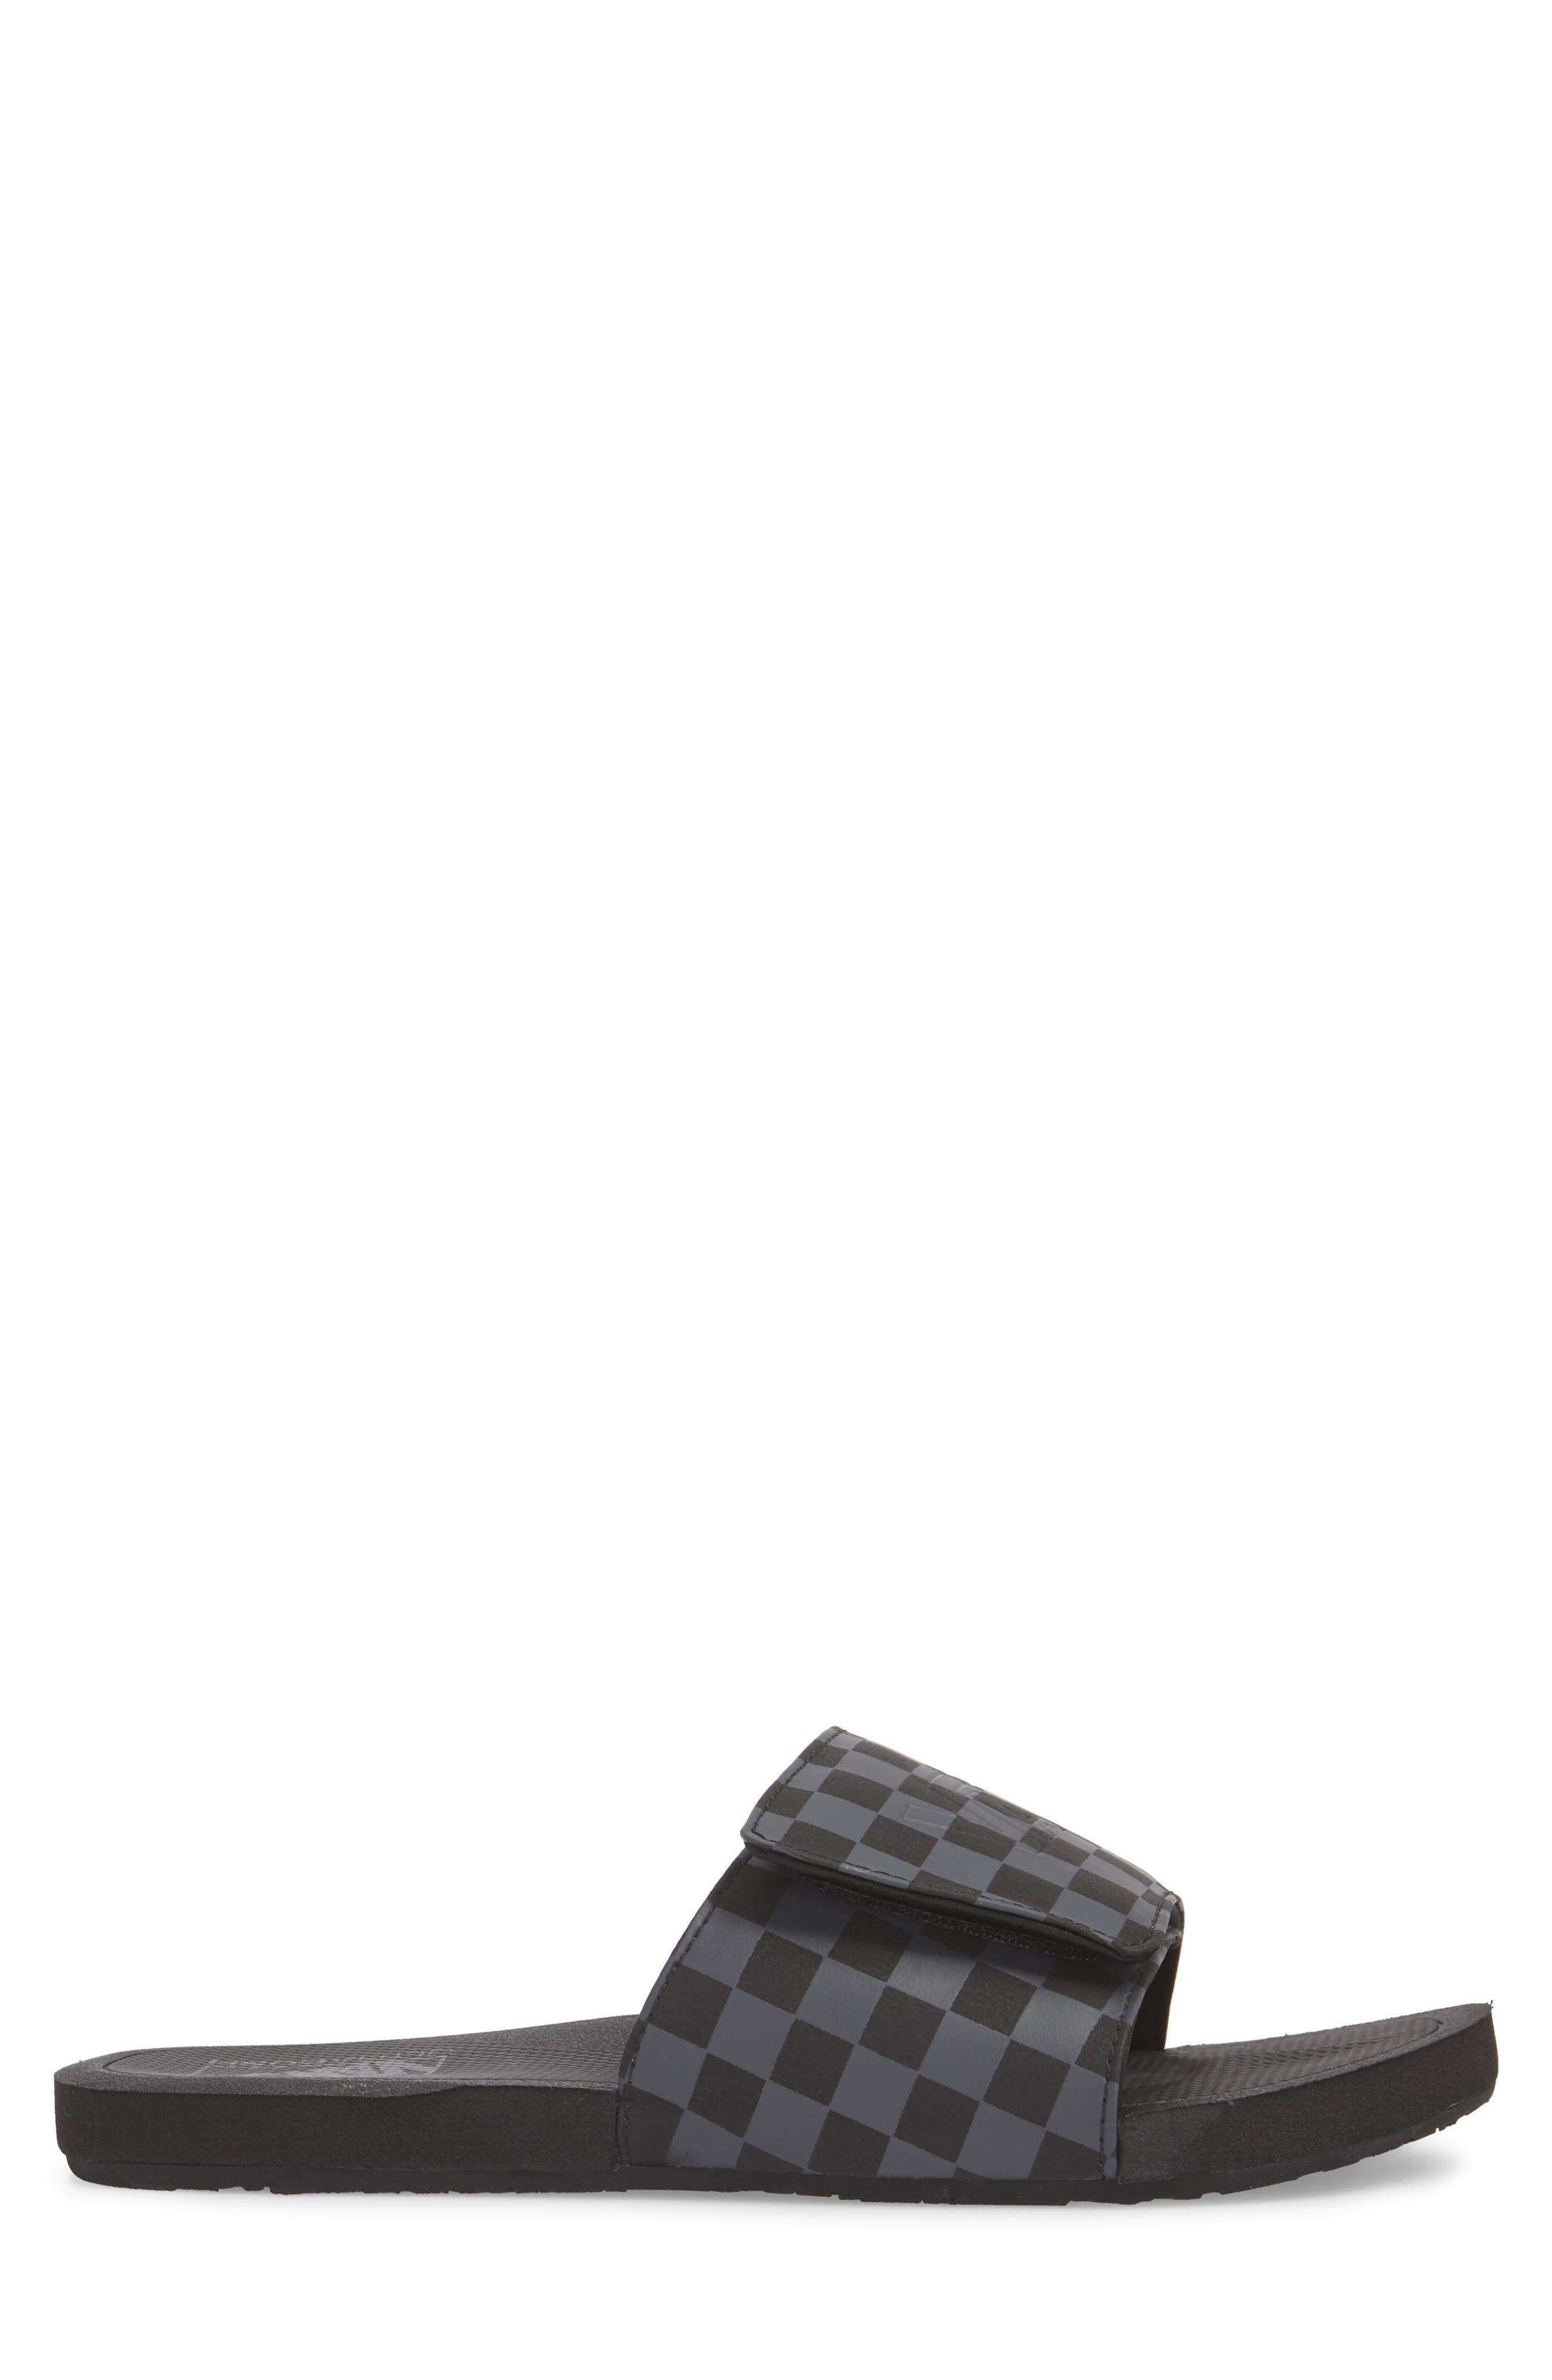 Nexpa Slide Sandal,                             Alternate thumbnail 3, color,                             Black/ Asphalt